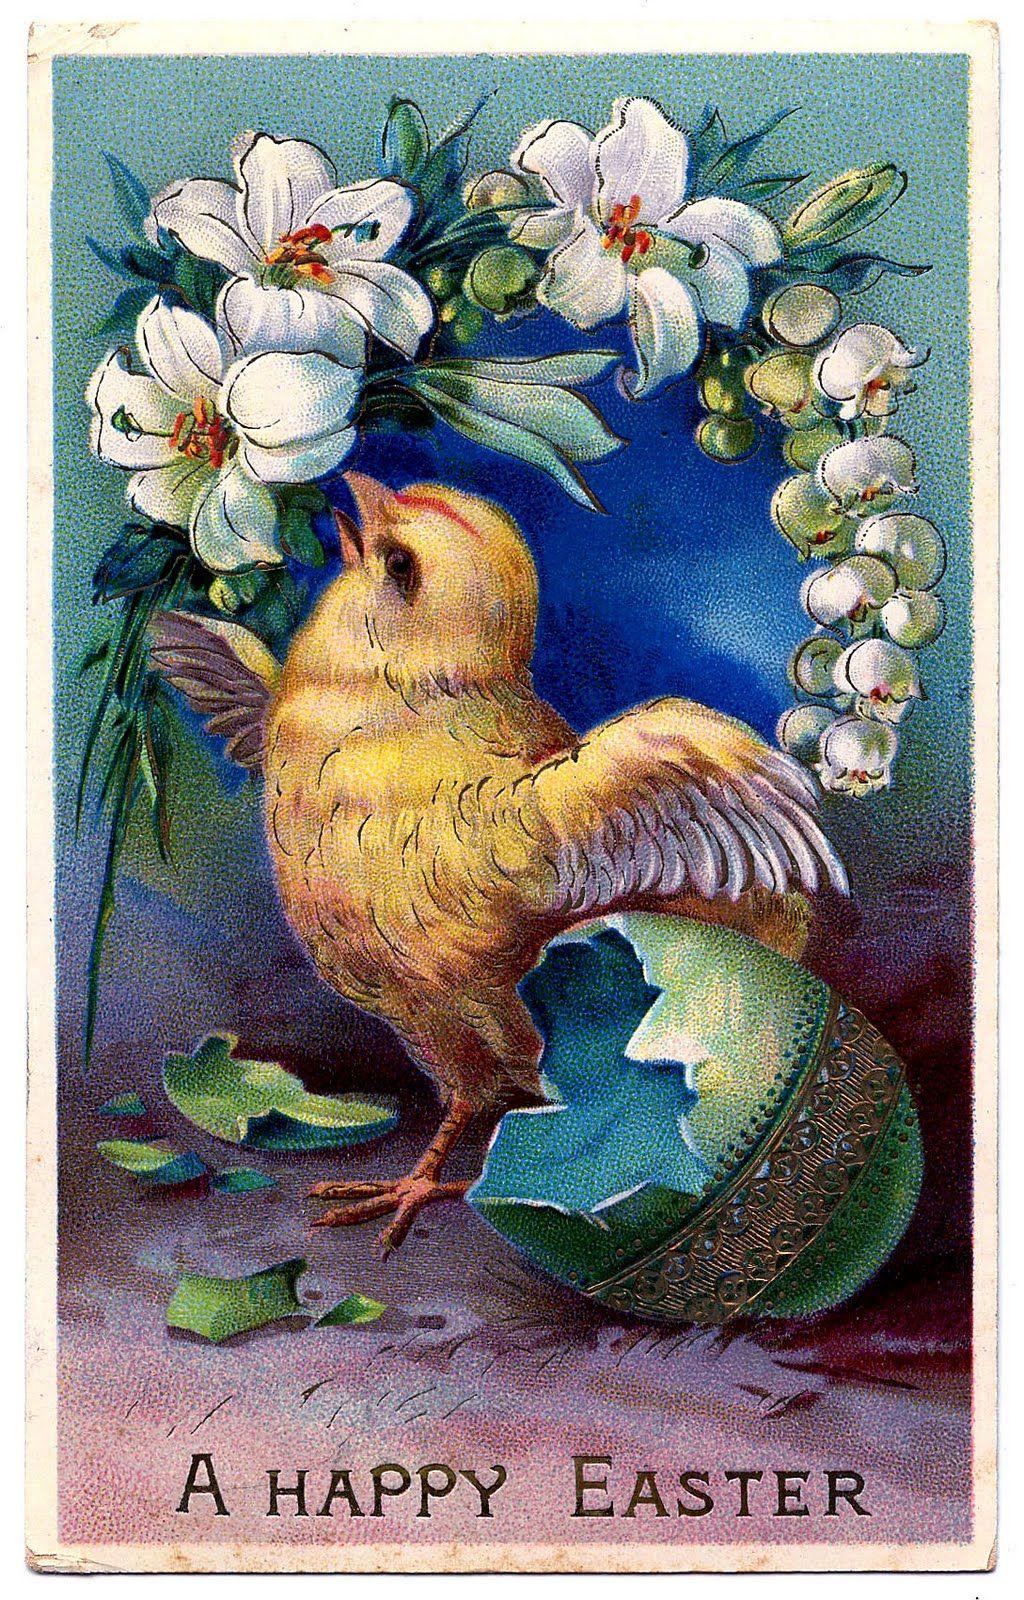 Vintage Easter Clip Art Sweet Baby Chick with Egg – Vintage Easter Cards